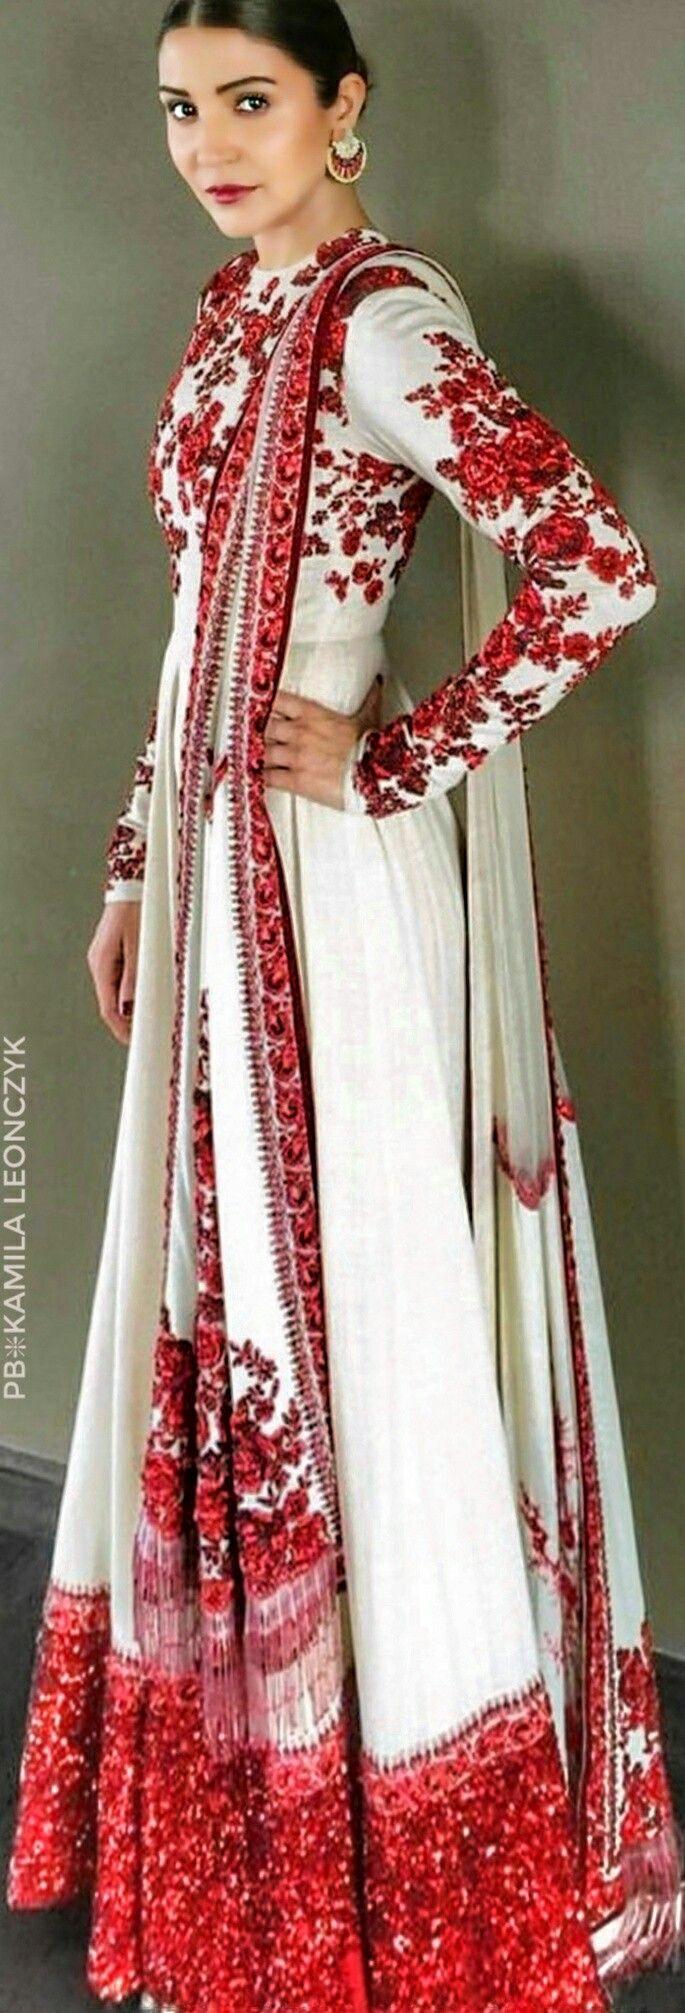 Rimple & Harpreet Narula Outfits and Isharya Earrings